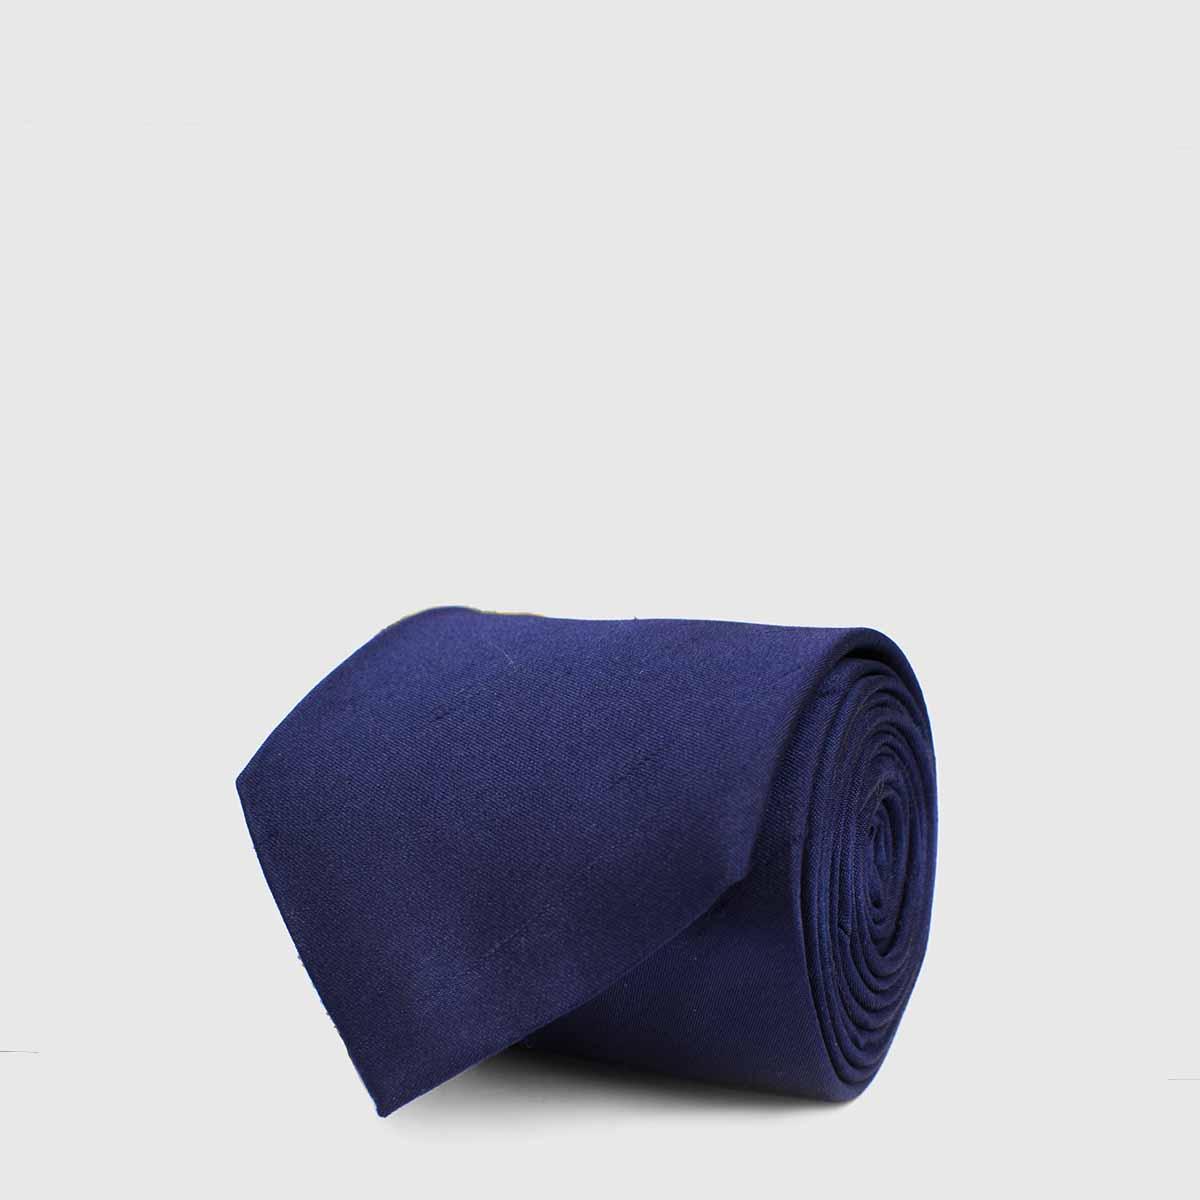 5-fold Tie dark blue